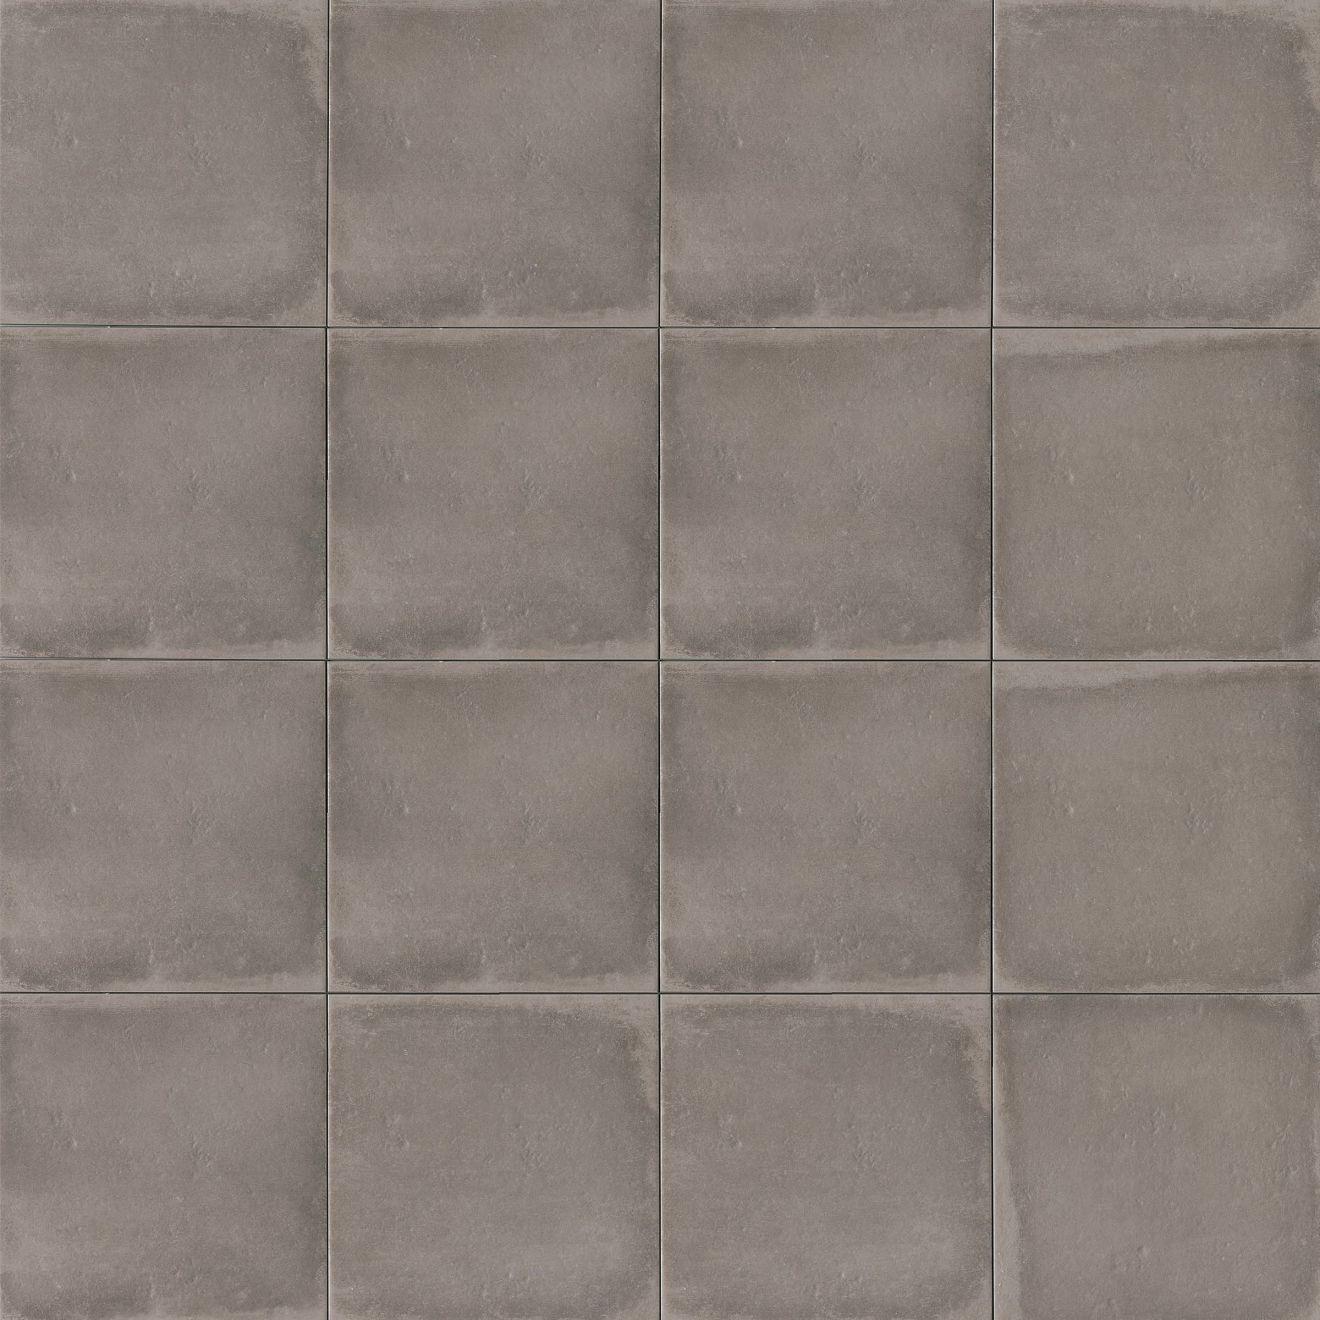 palazzo tile